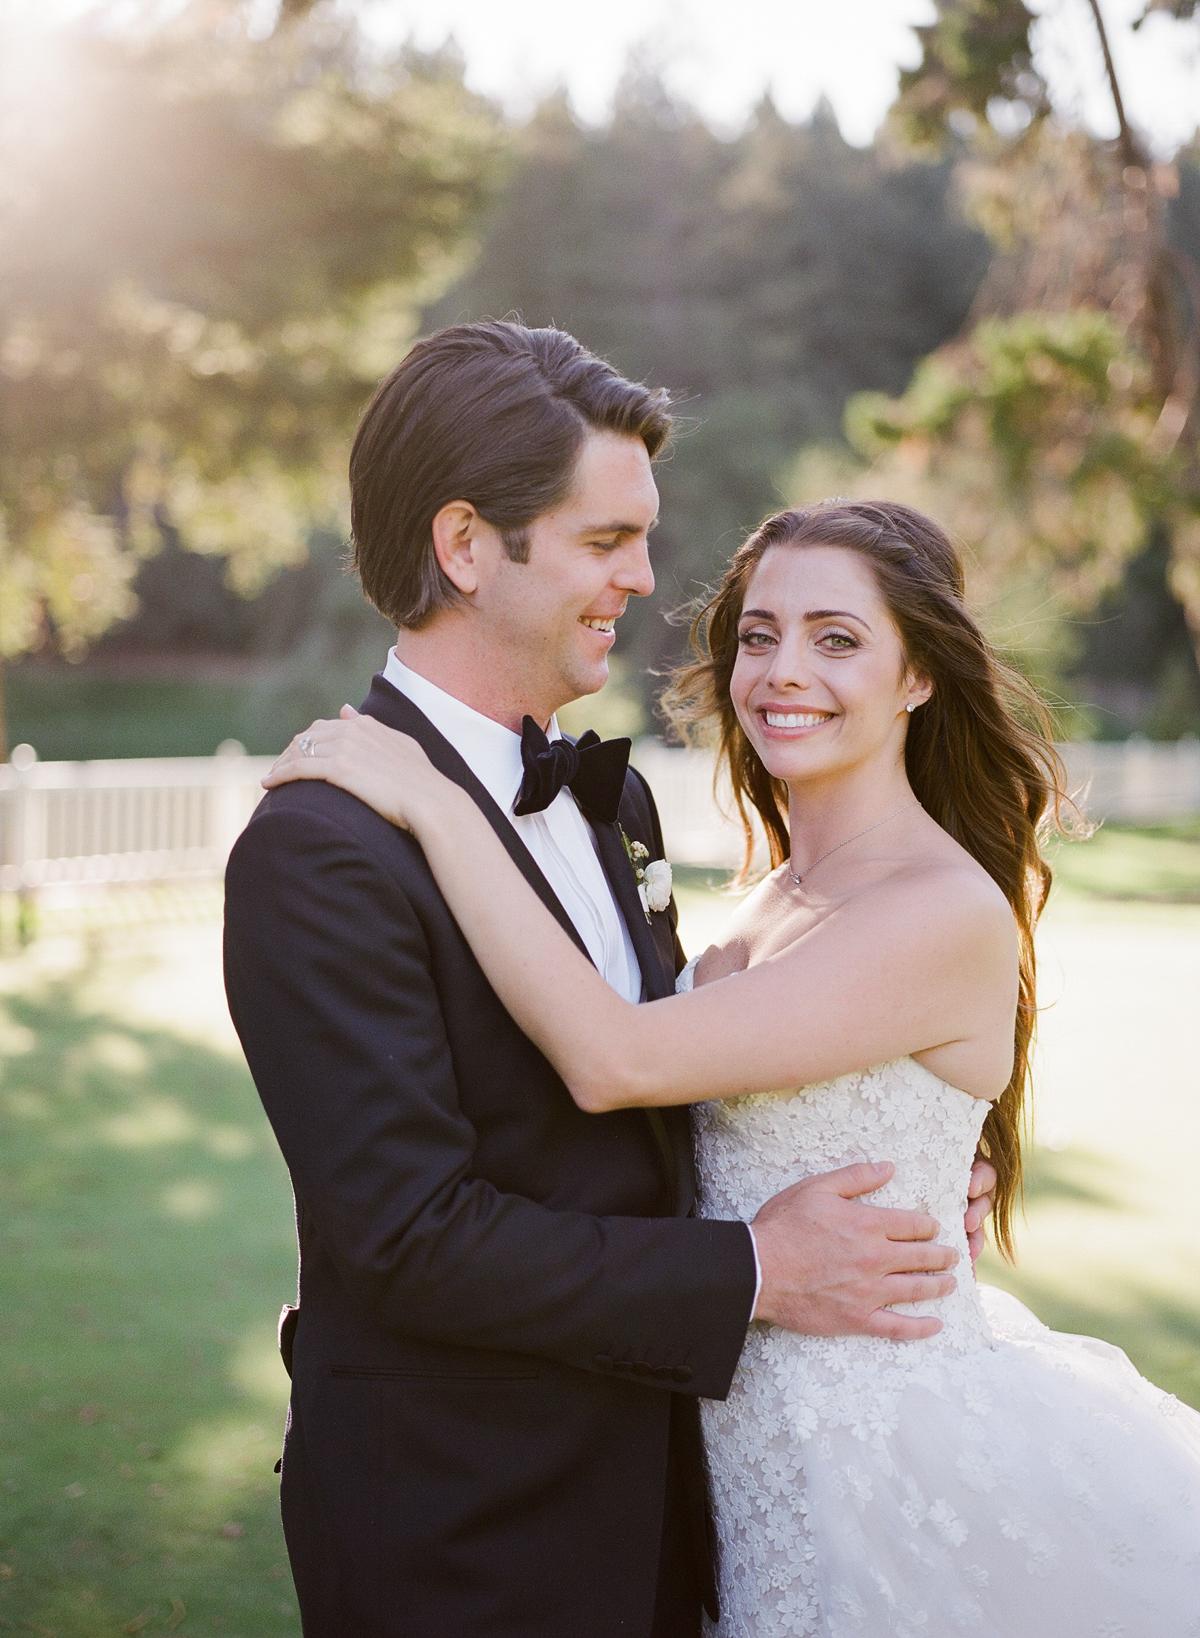 alessa andrew wedding groom smiling at bride